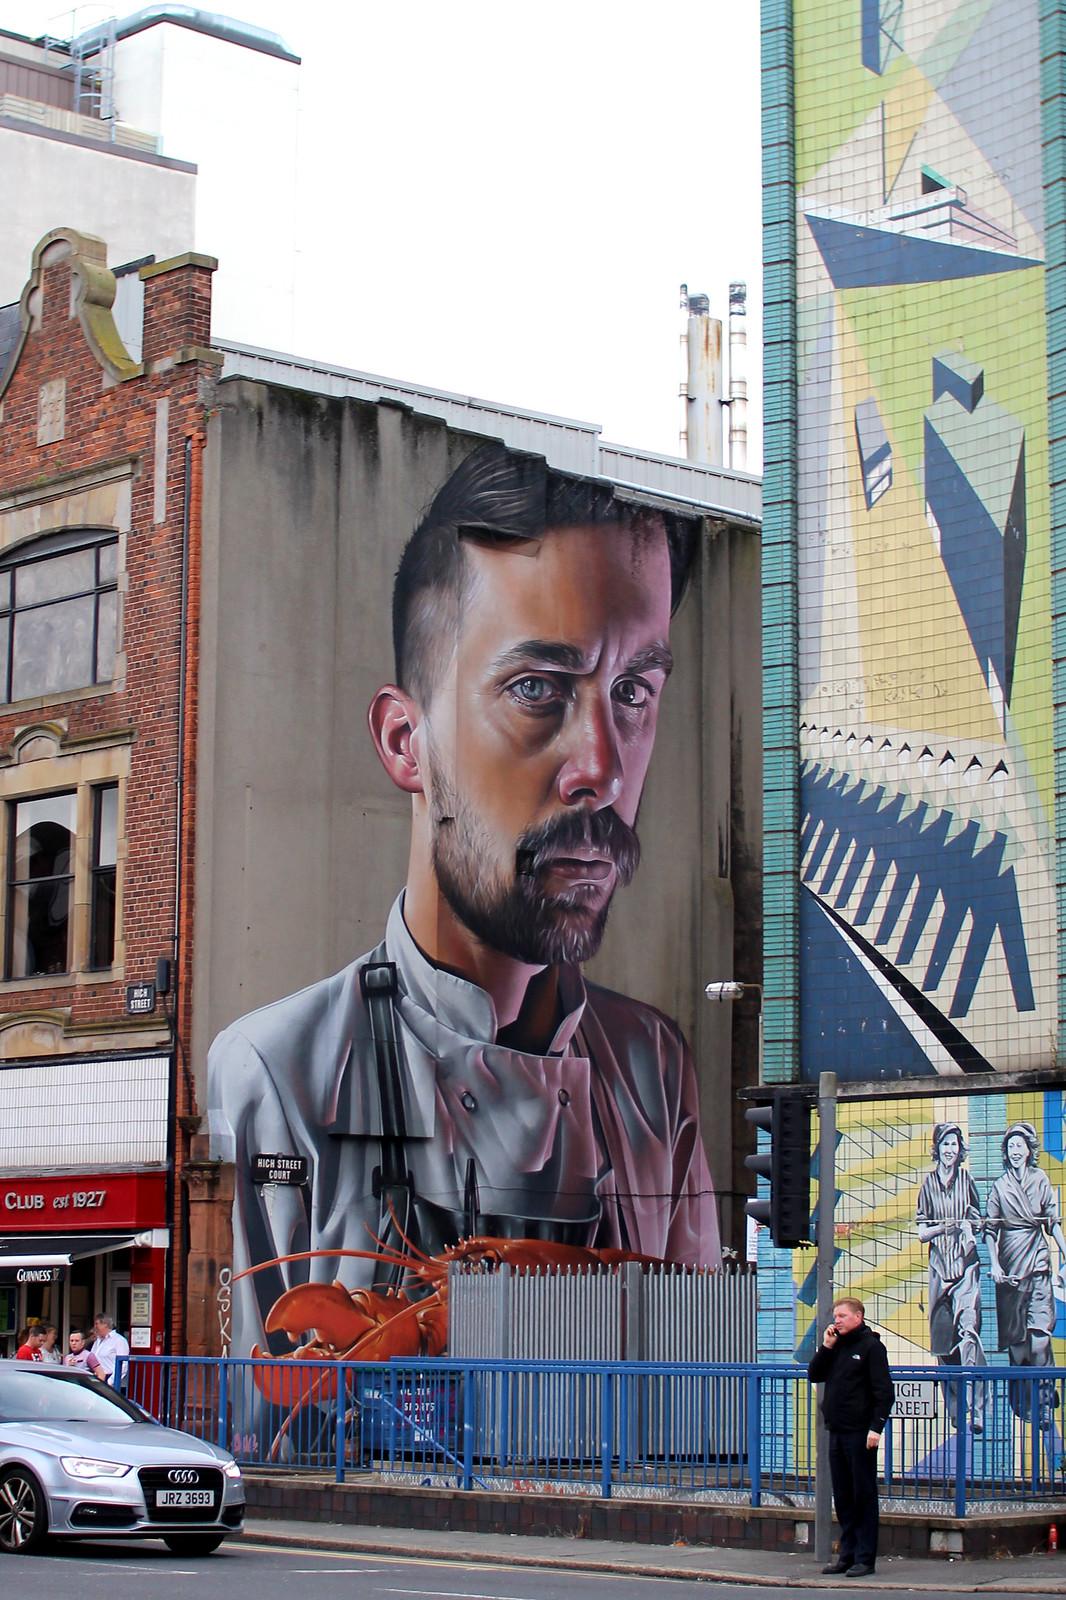 Street art murals Belfast 48 hour guide travel blogger UK Northern Ireland